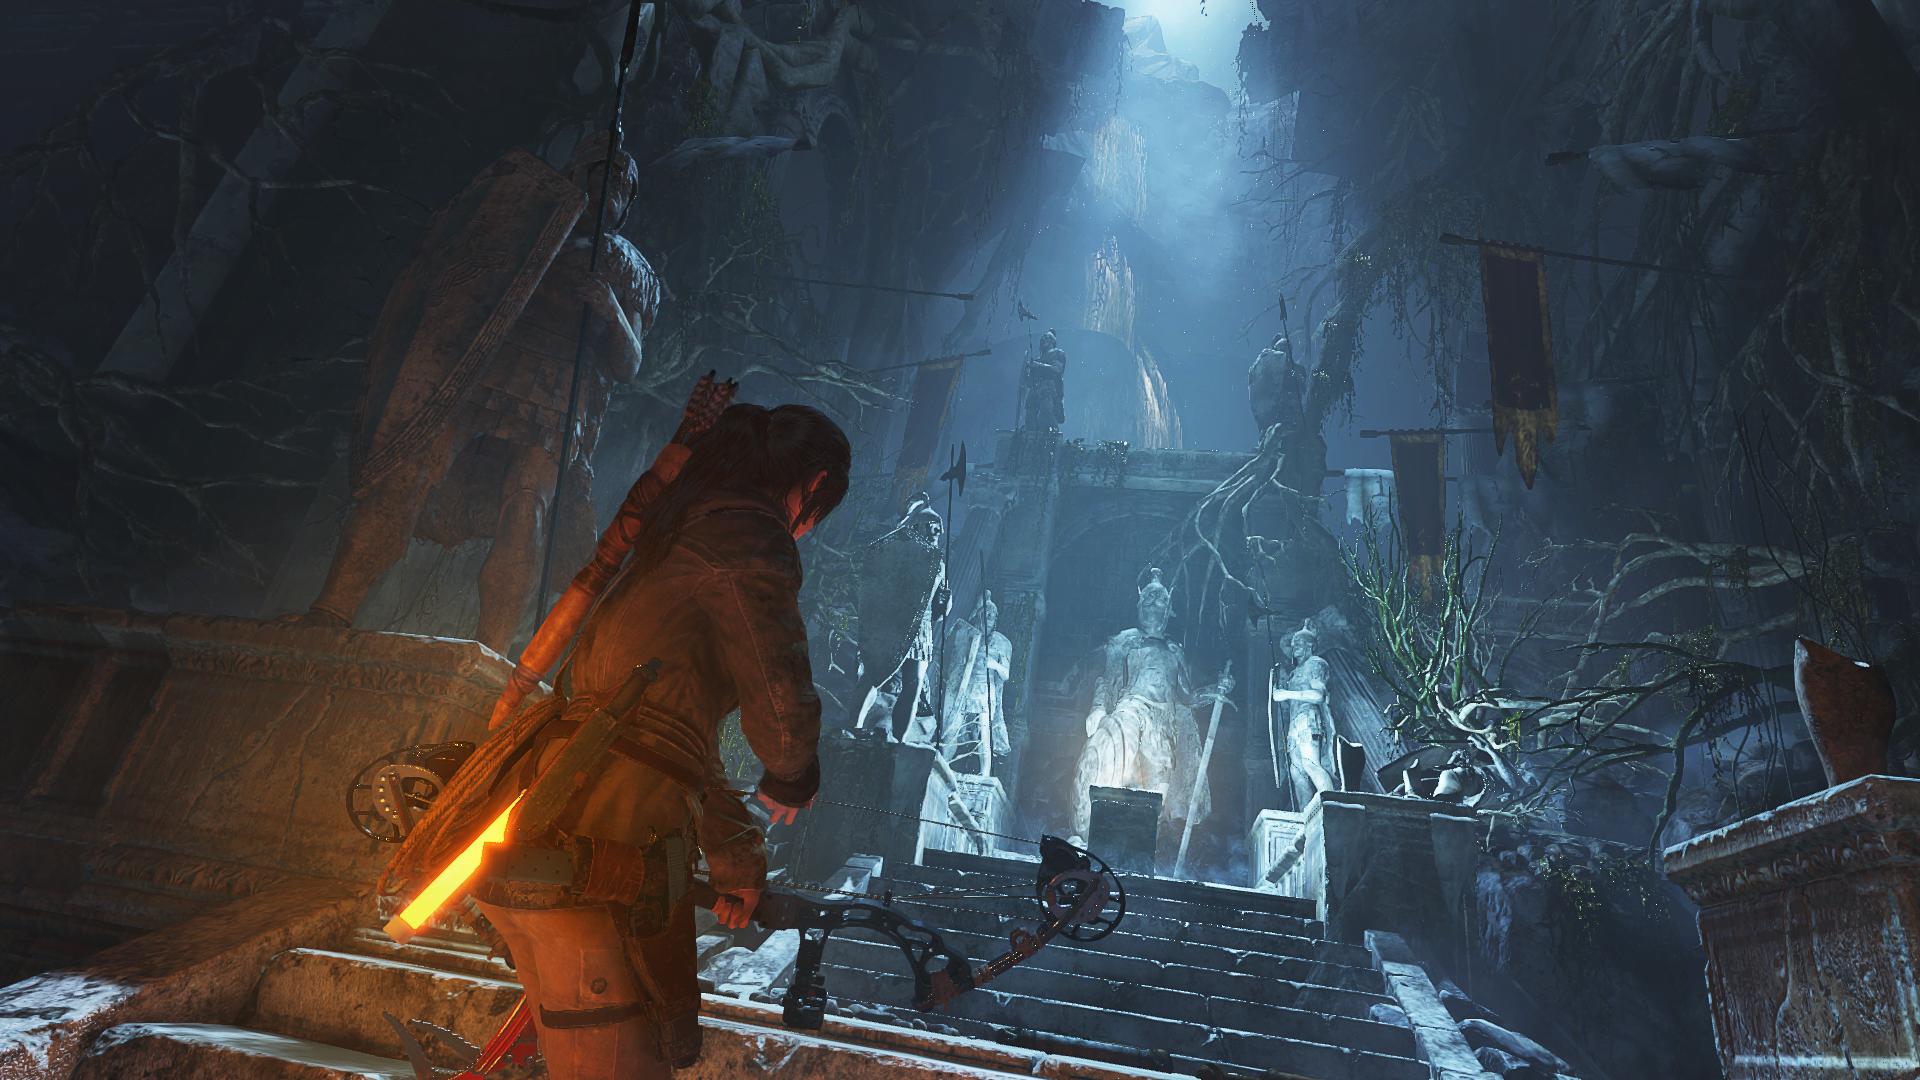 Gamesradar tomb raider mod nude scene